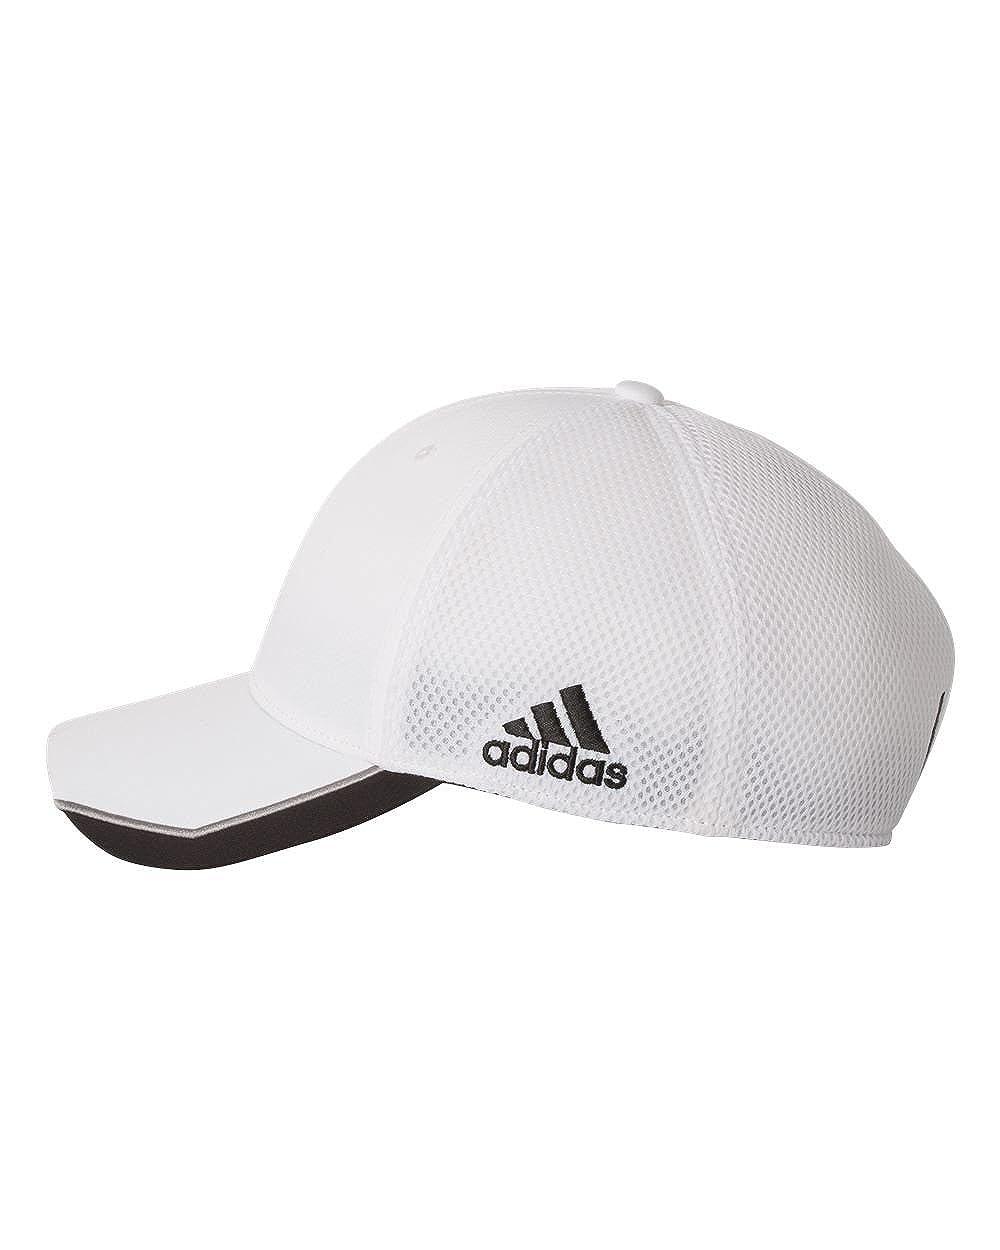 093deabe532 Amazon.com  adidas-Tour Mesh Cap-A620-SM MD-Bahia Blue- White  Sports    Outdoors